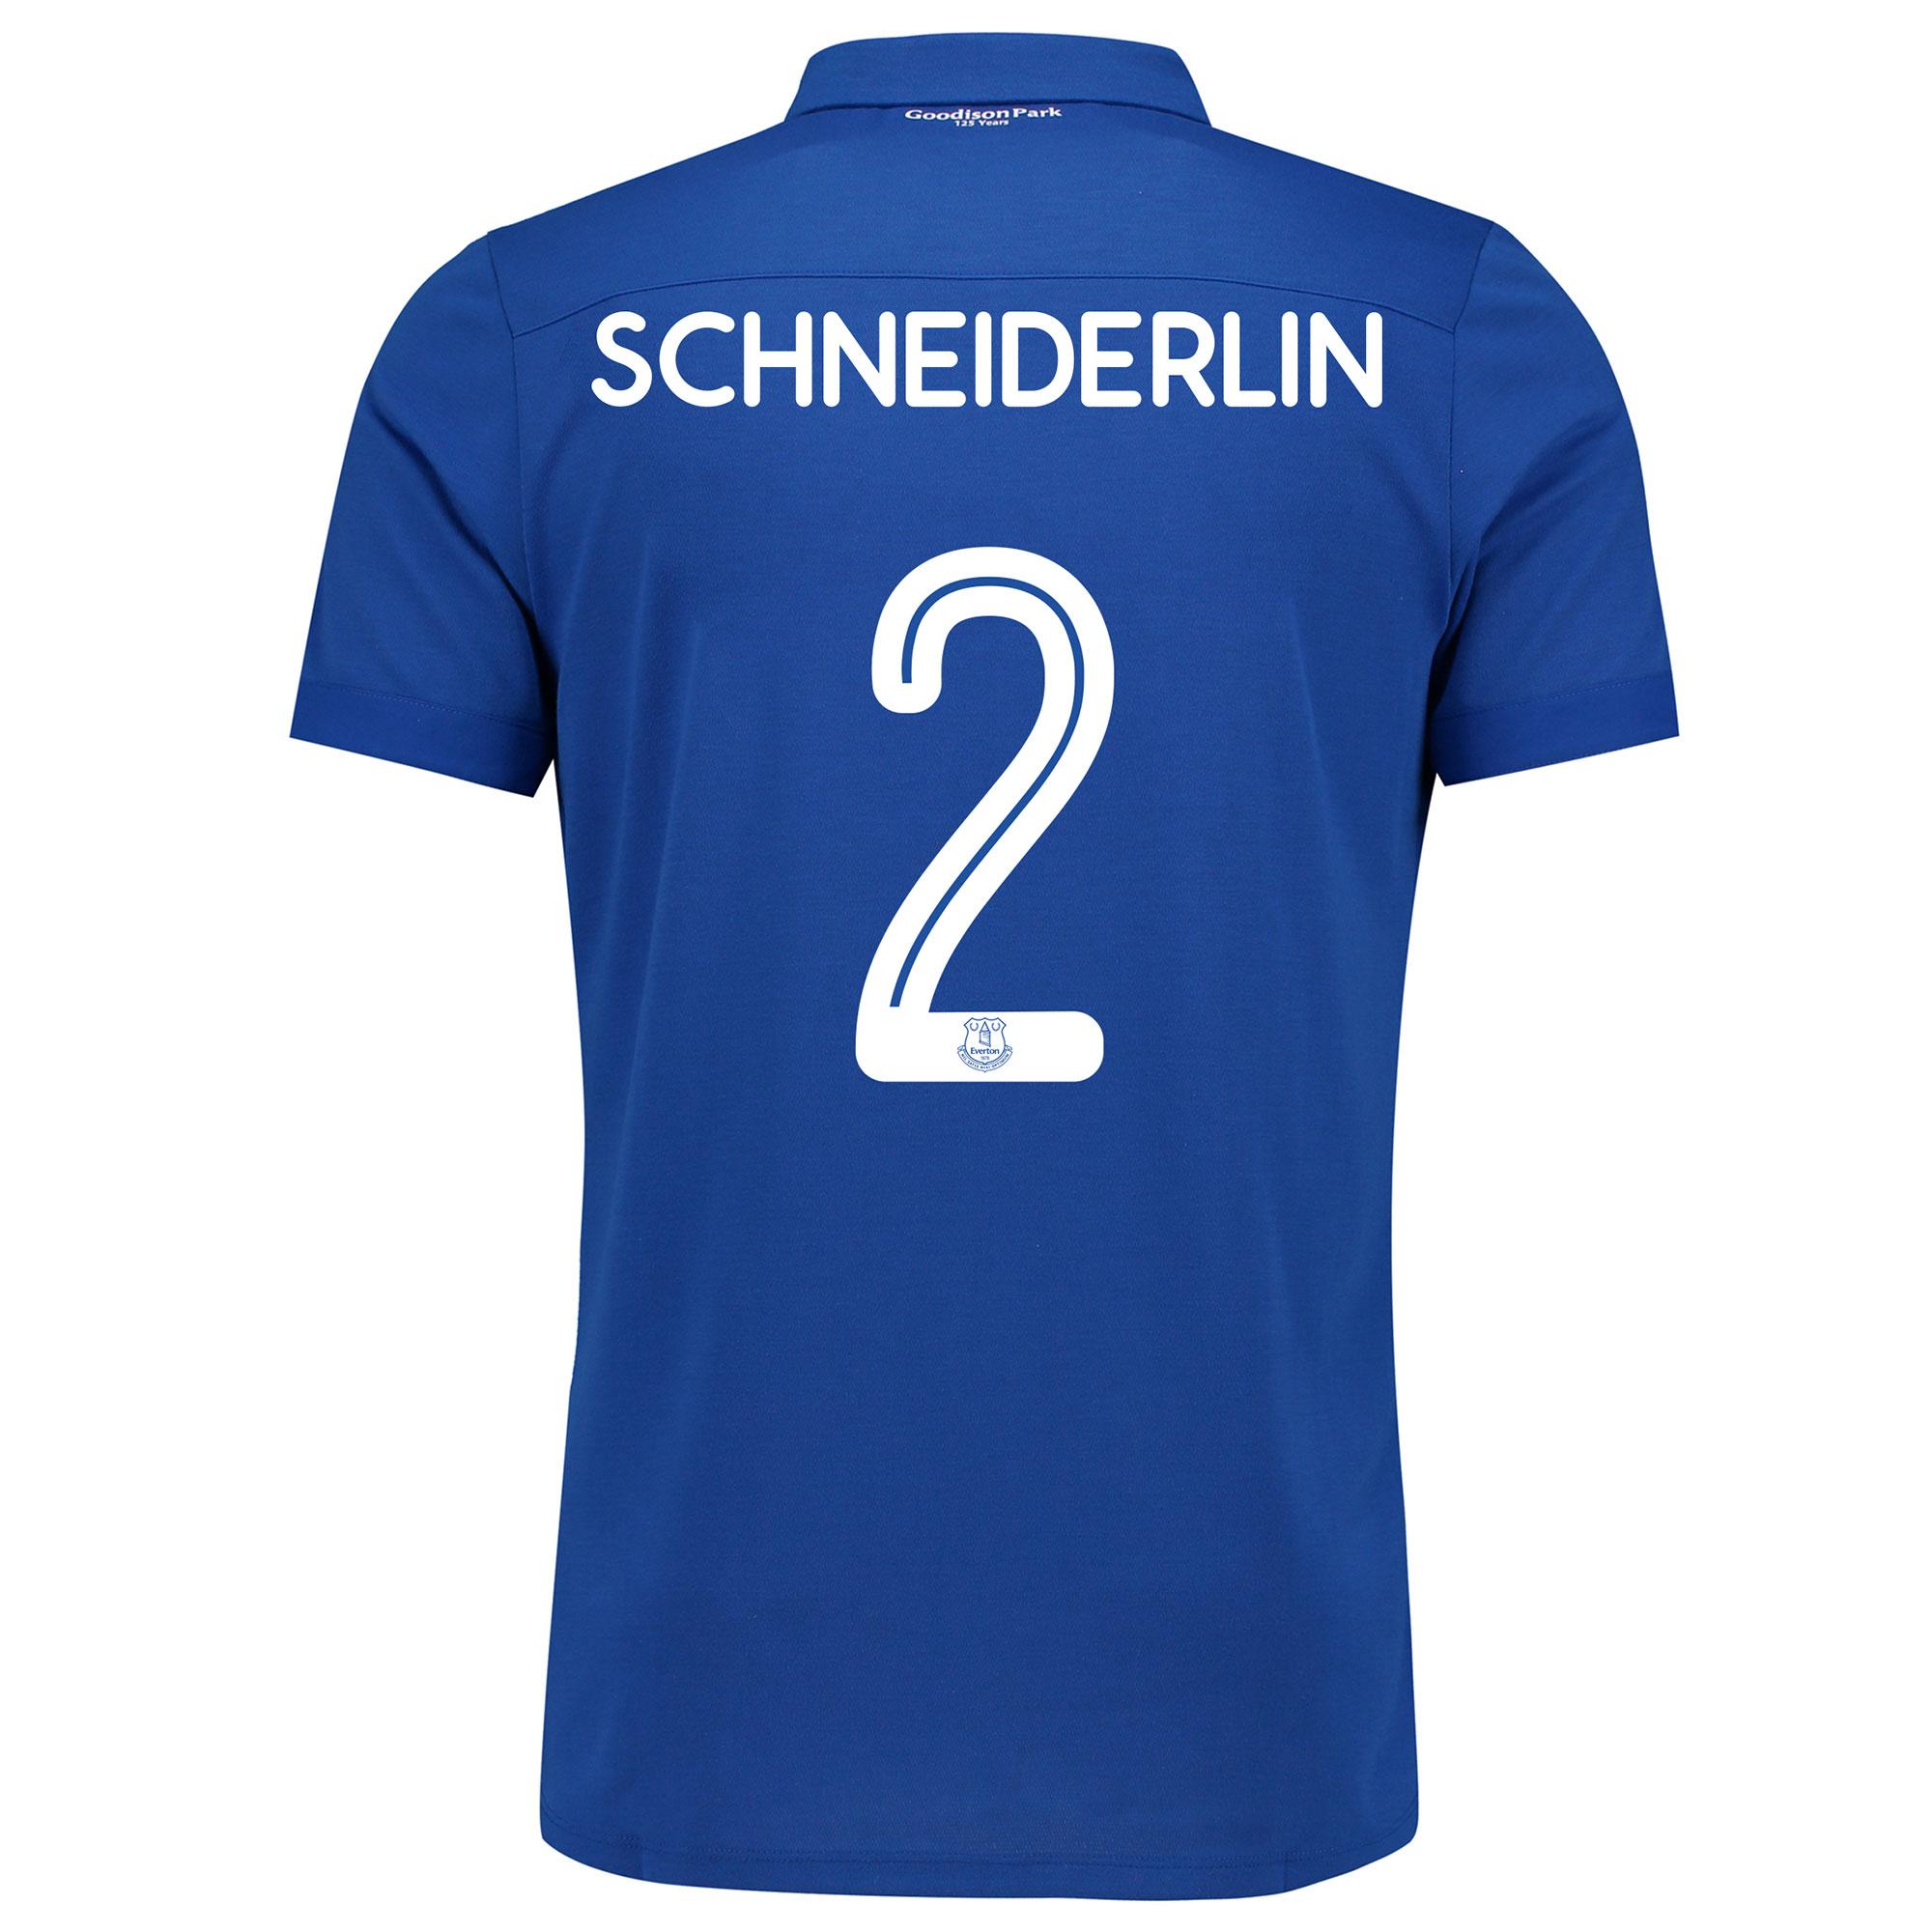 Image of Everton Commemorative Shirt with Schneiderlin 2 printing